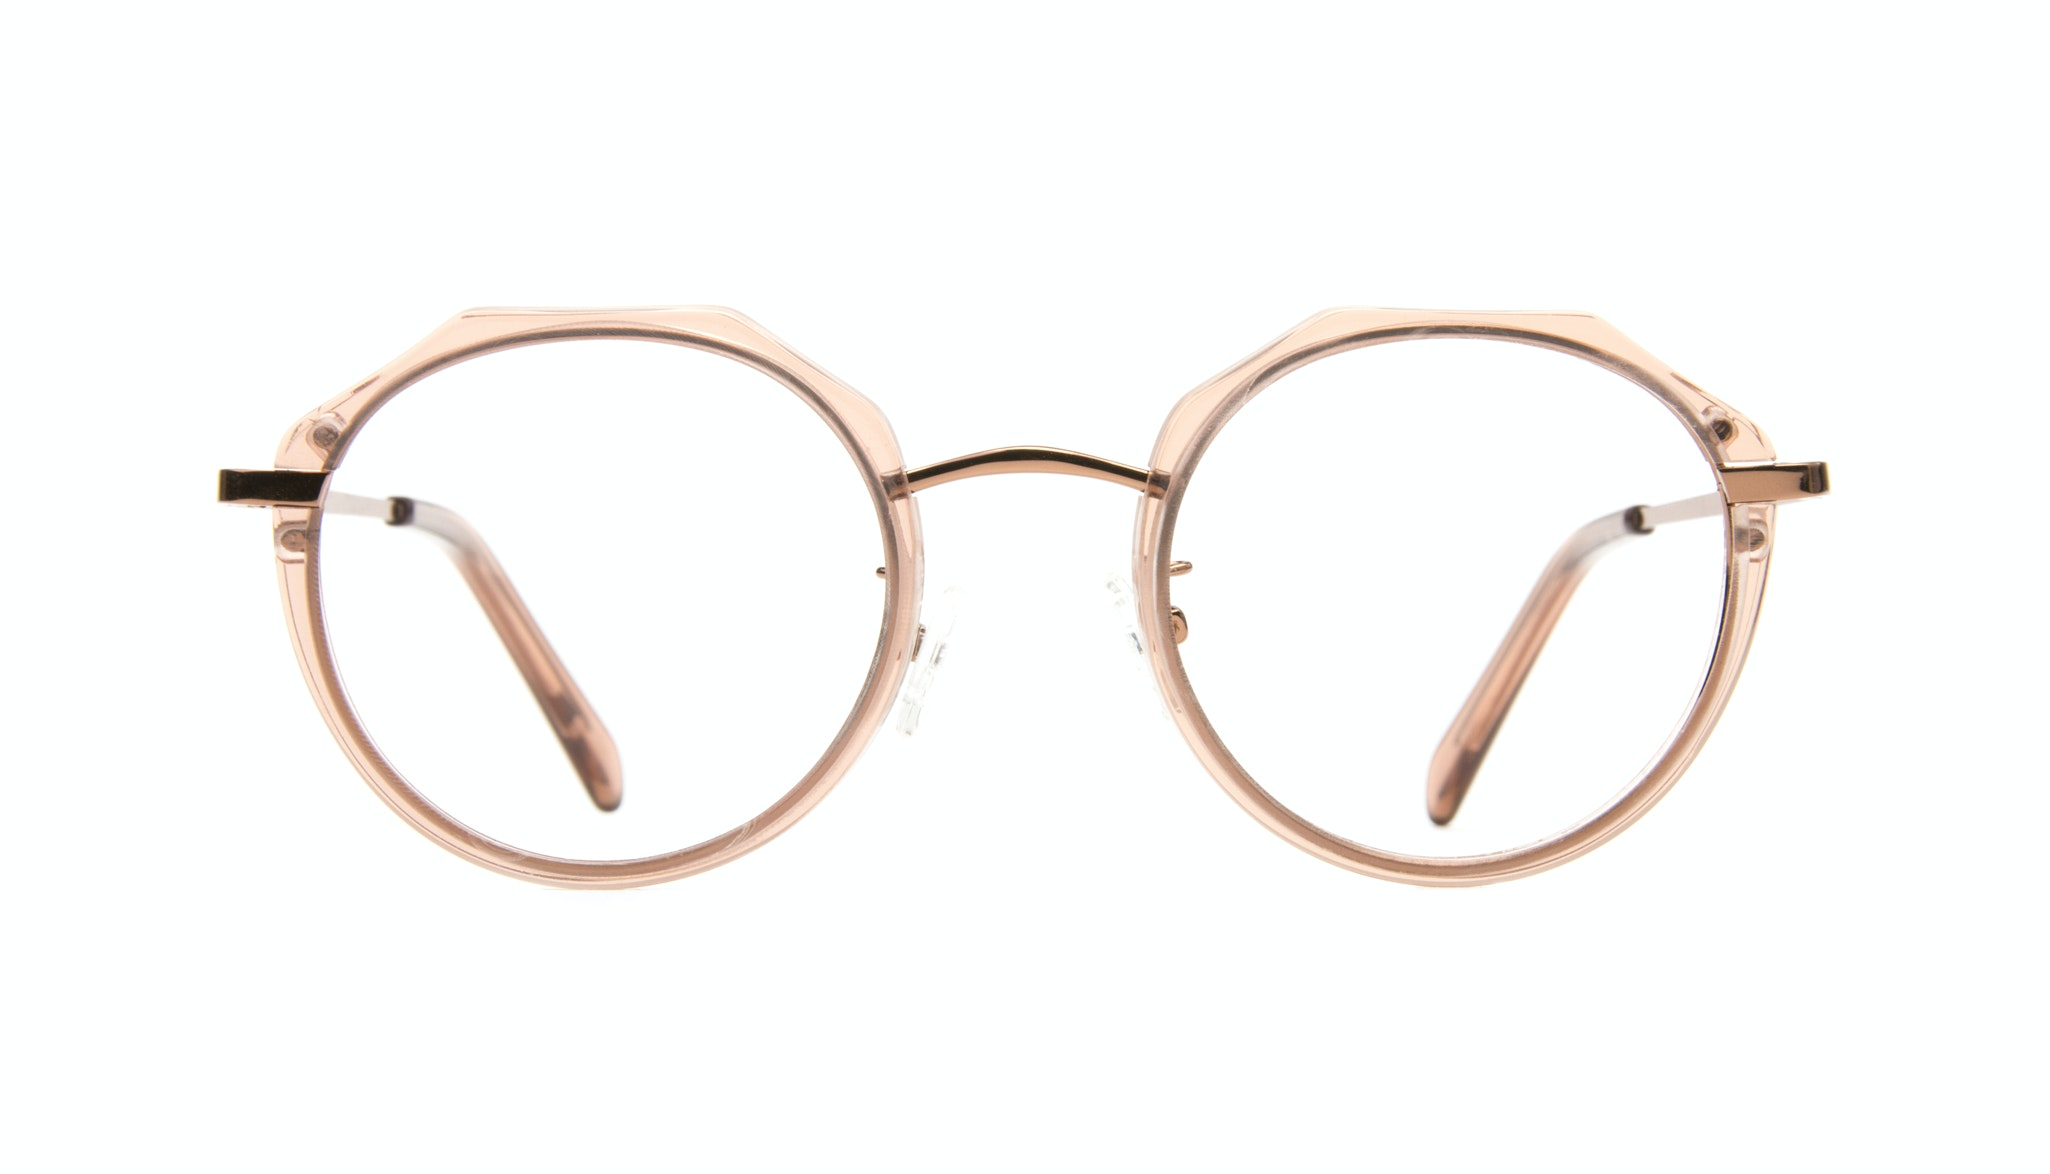 Affordable Fashion Glasses Round Eyeglasses Women Vitality Rose